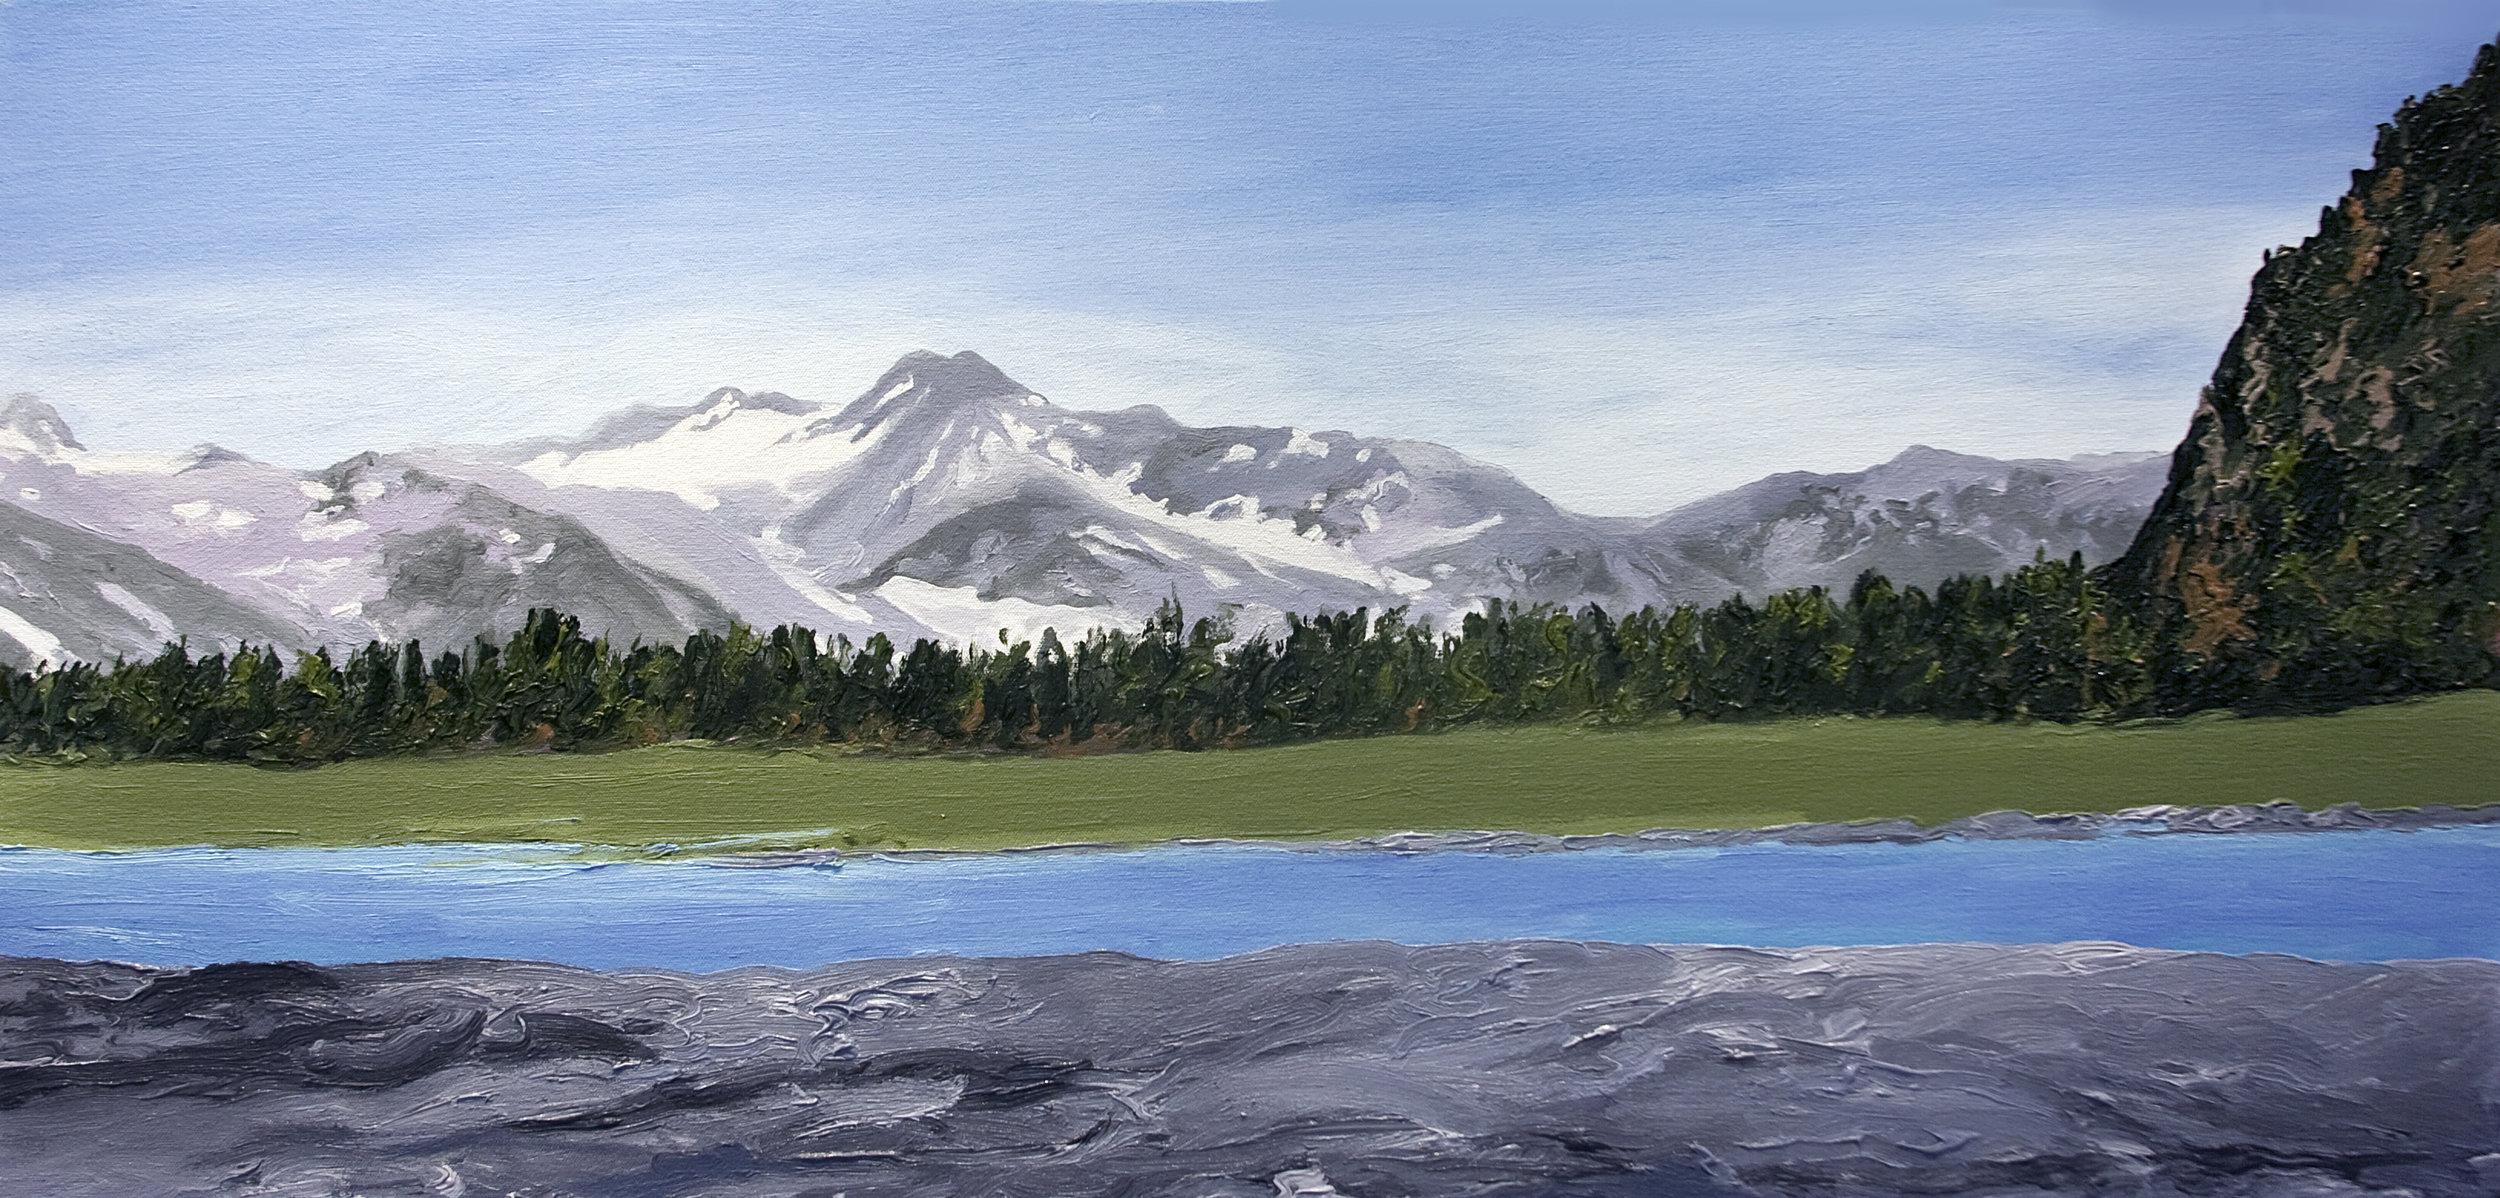 Bear Glacier #2, 2005, after Bruce Molnia